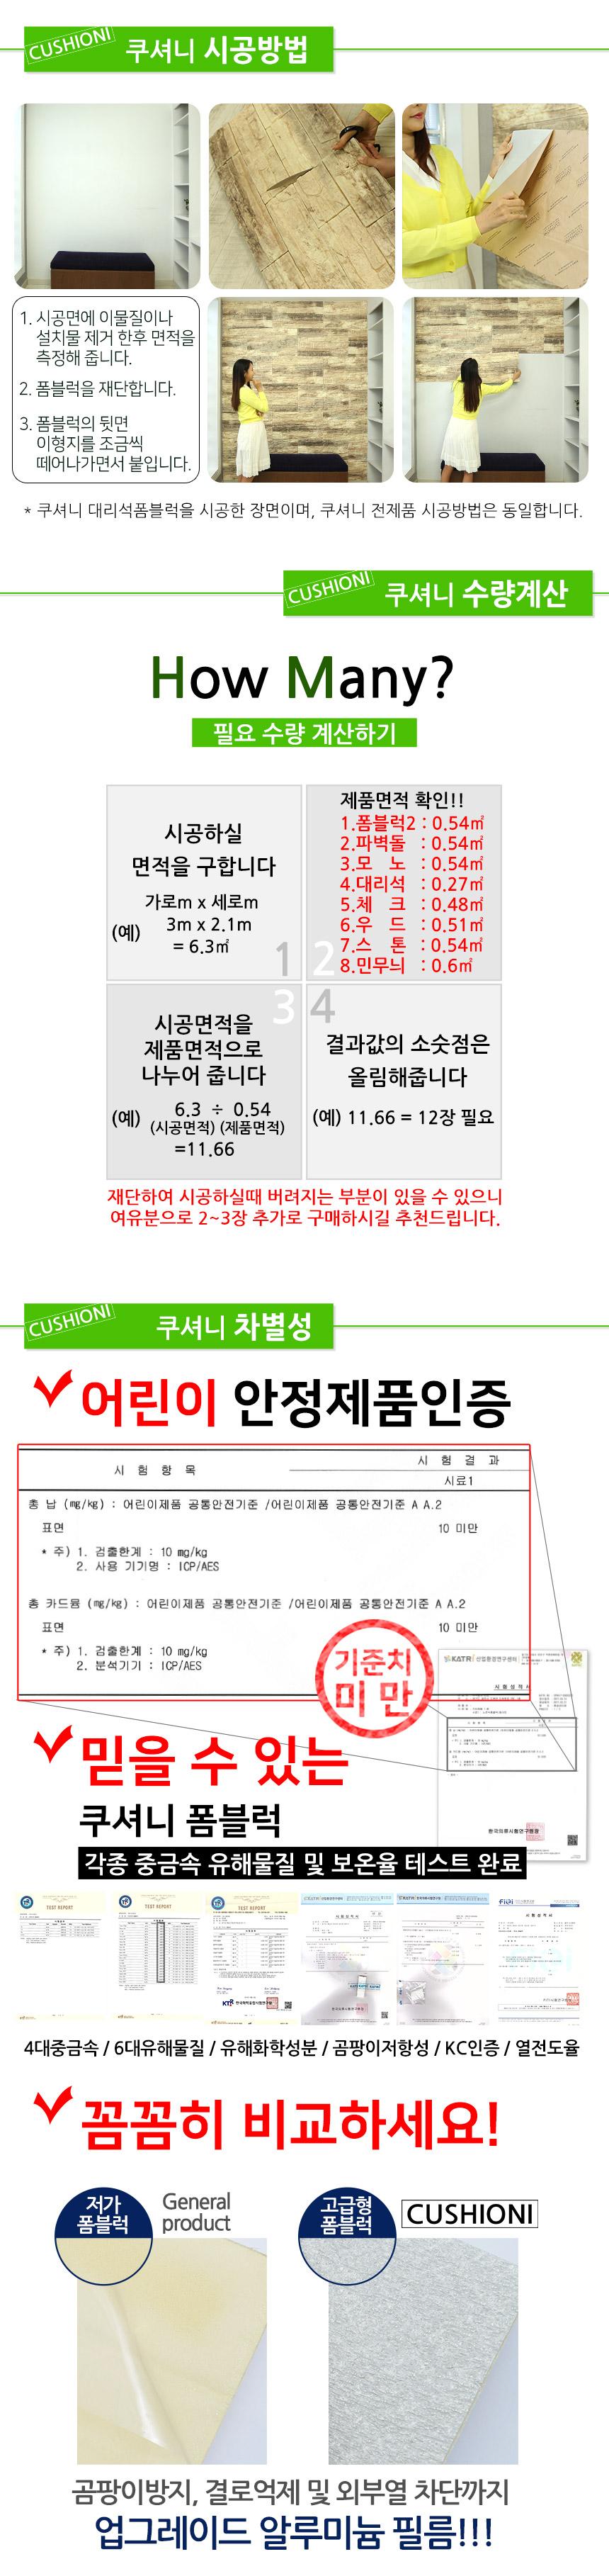 00_notice02.jpg